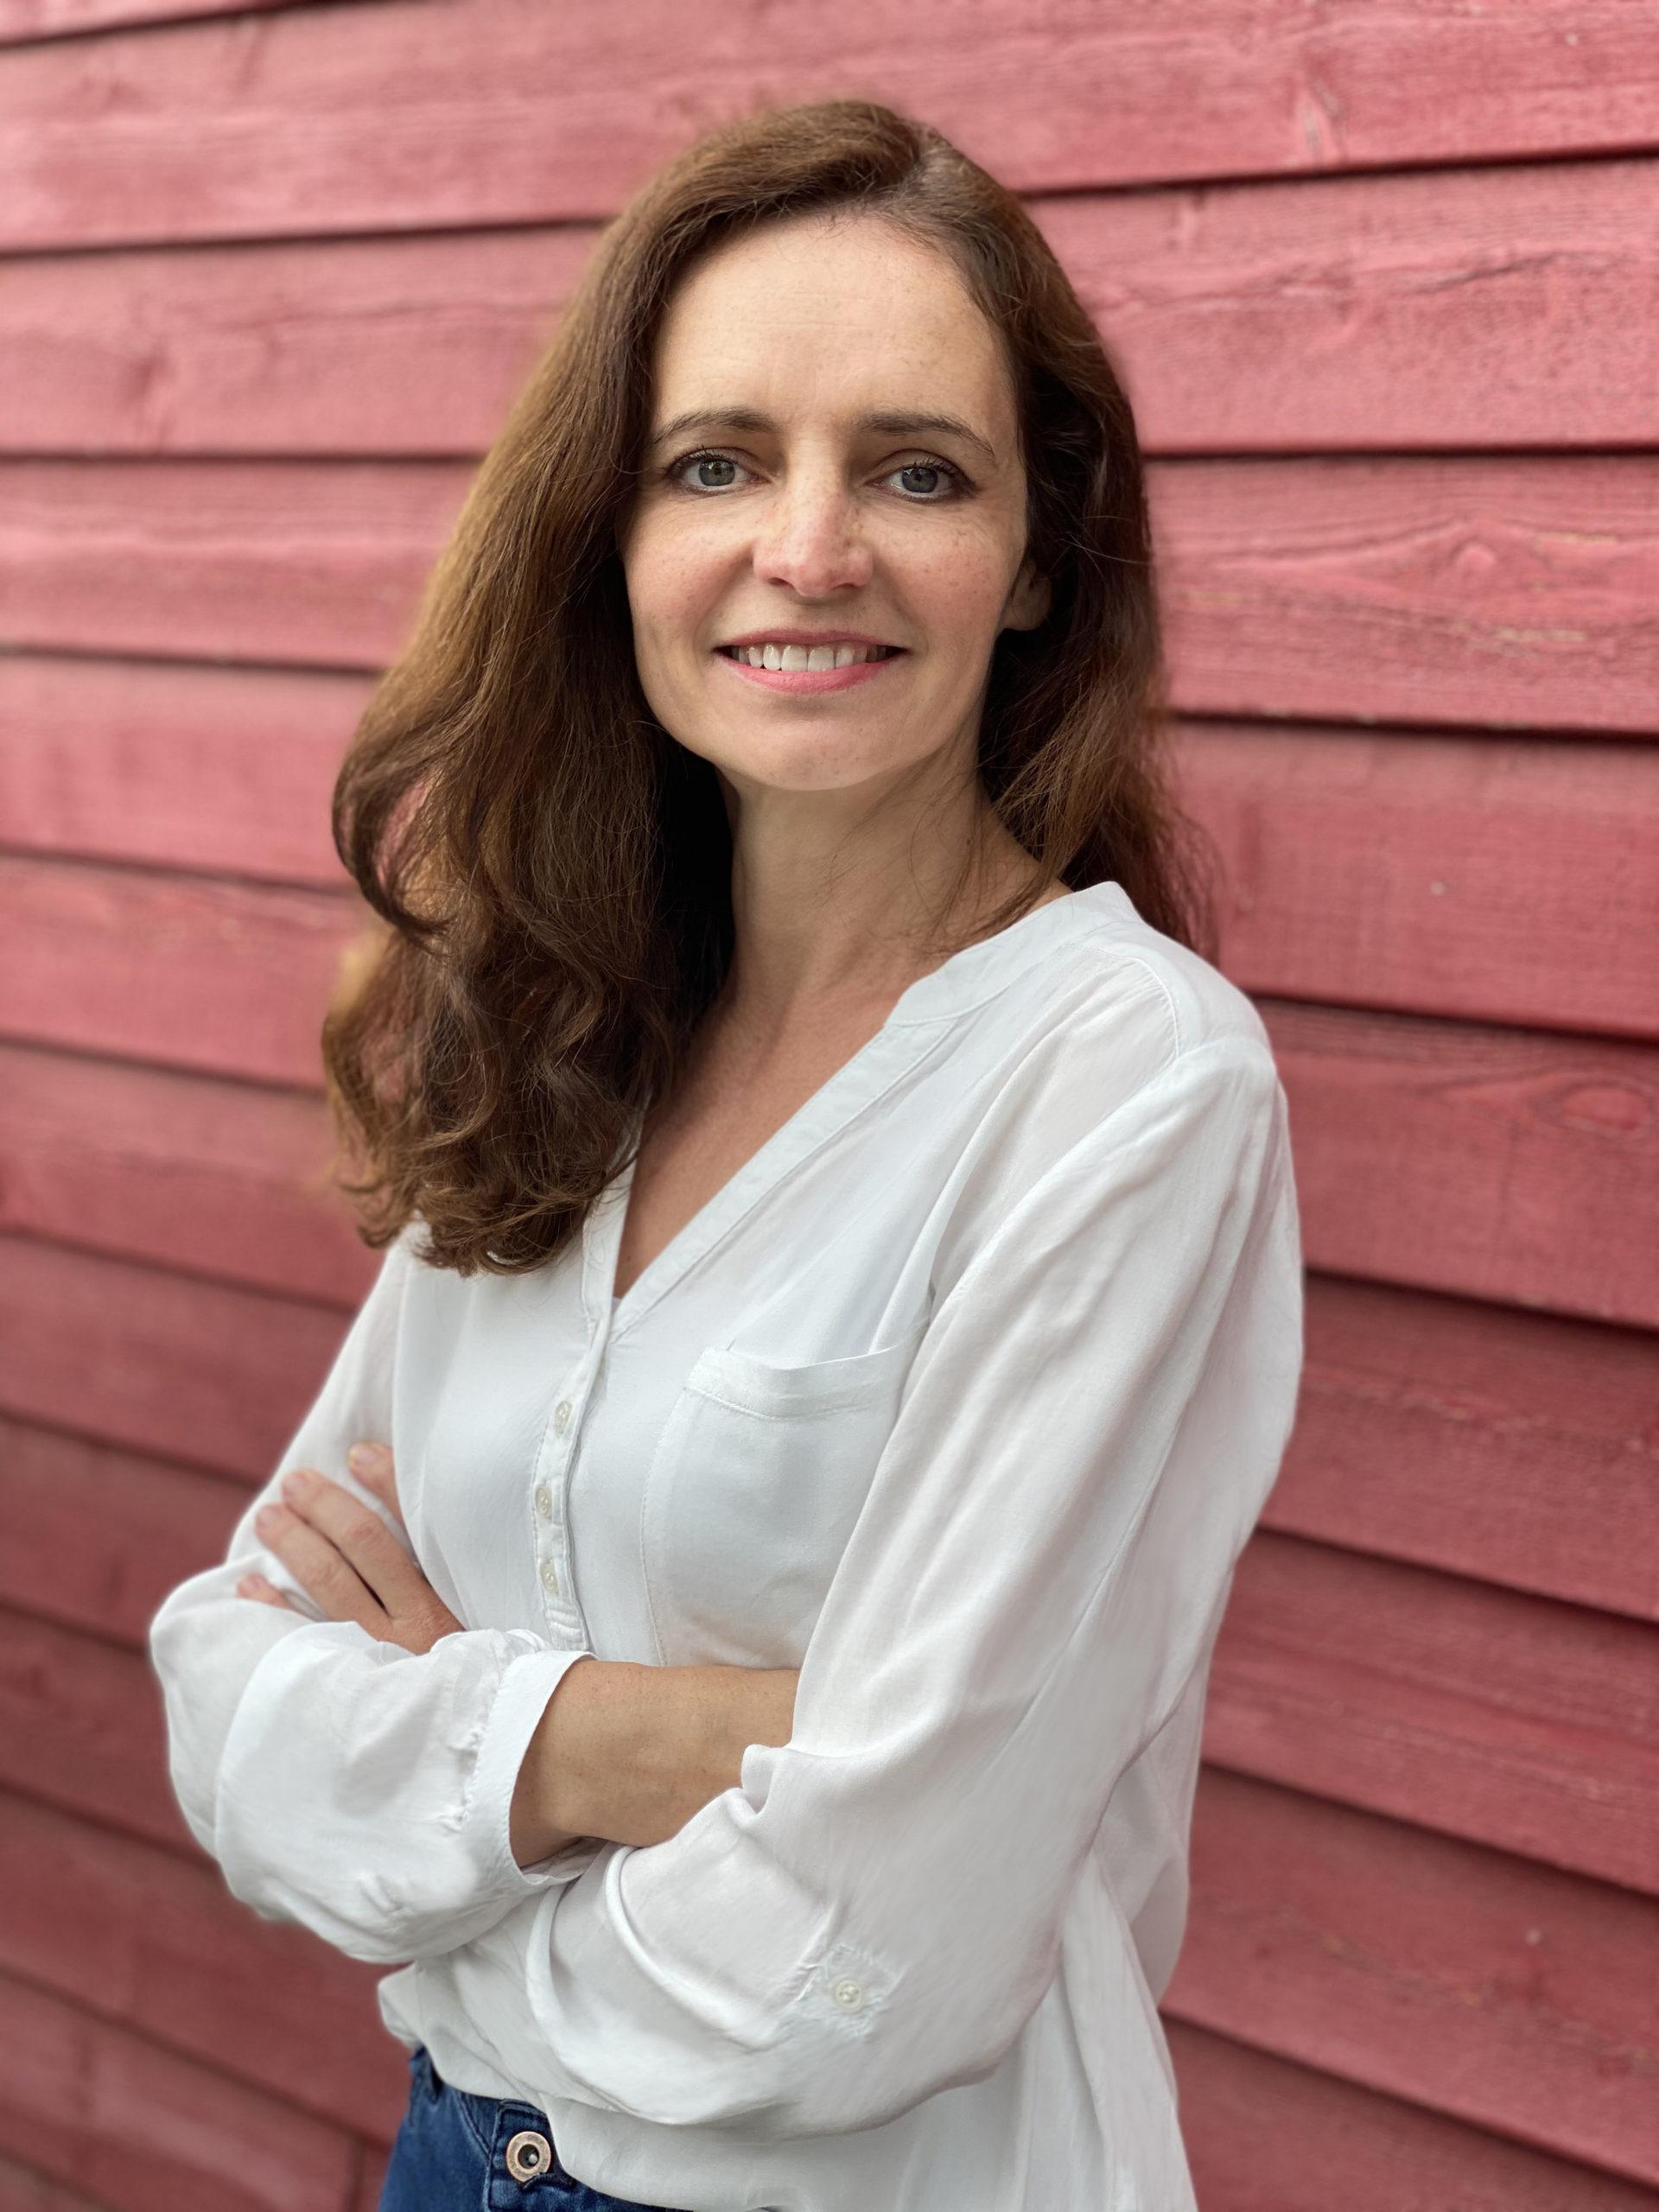 Tatjana Kiefler Virtuelle Assistentin Podcast Service Unterstützung Klang Schnitt Upload Assistenz